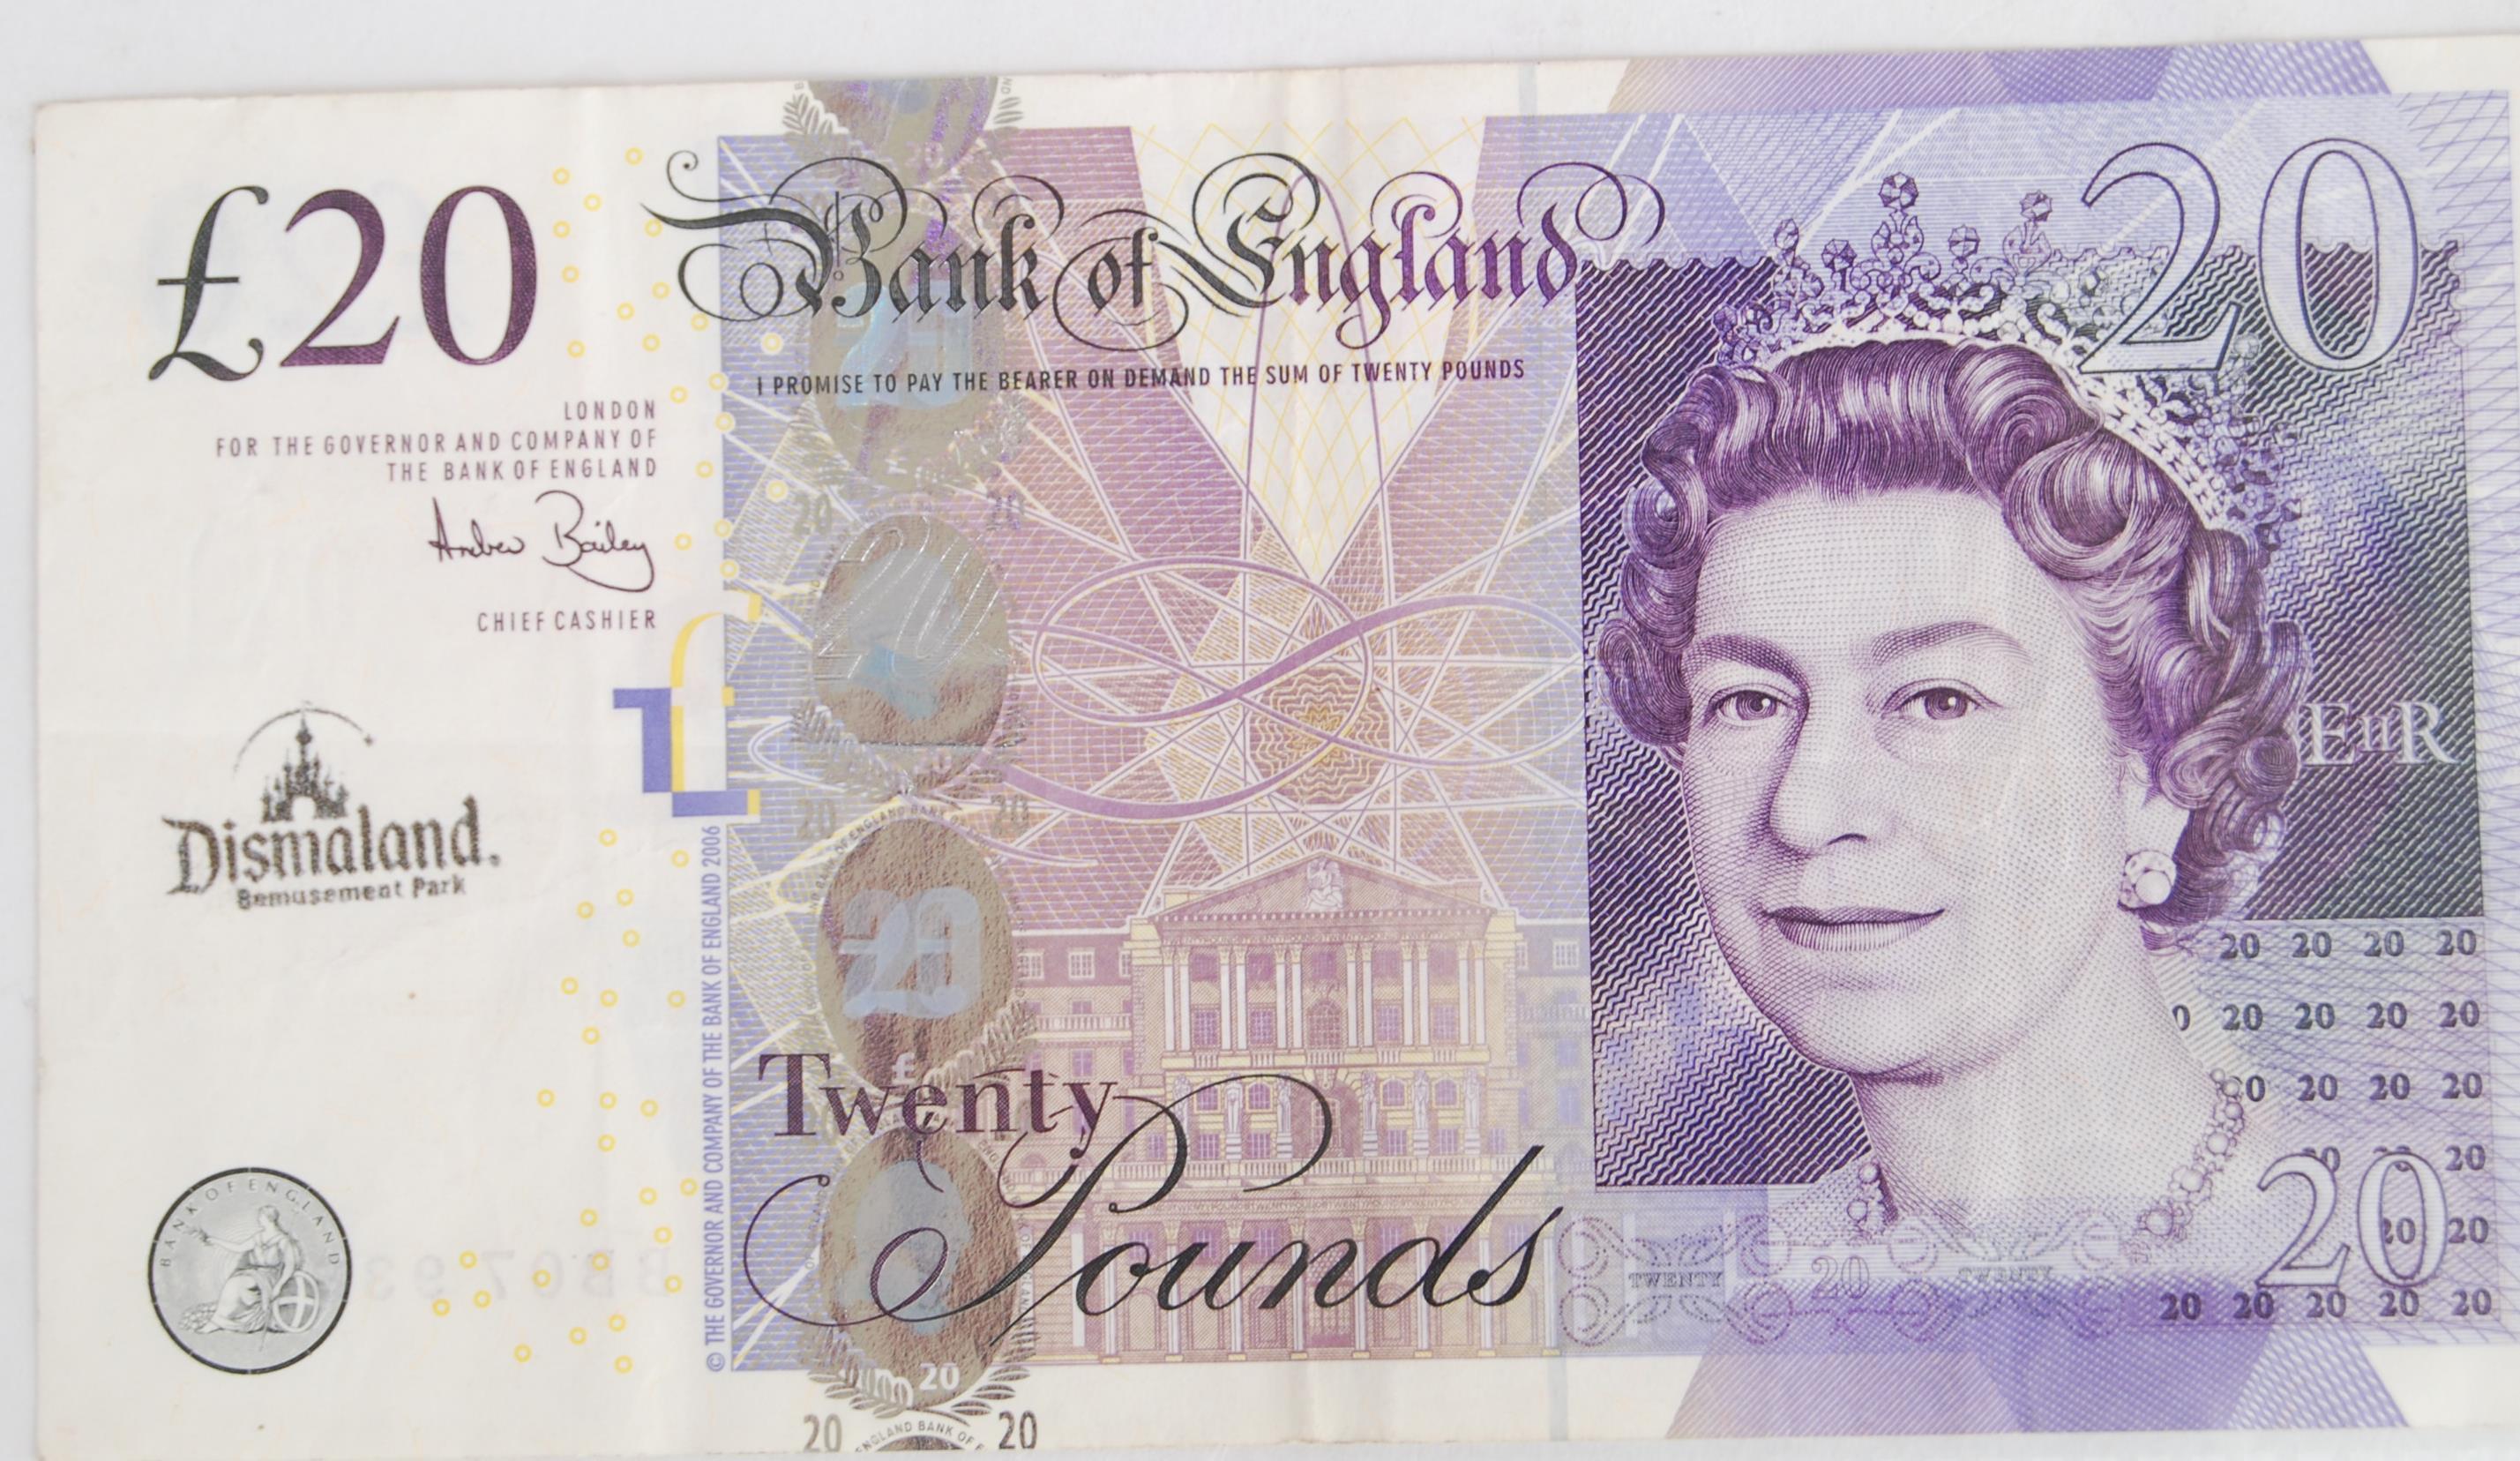 Dismaland 163 20 Note An Original Twenty Pound Note Stamped